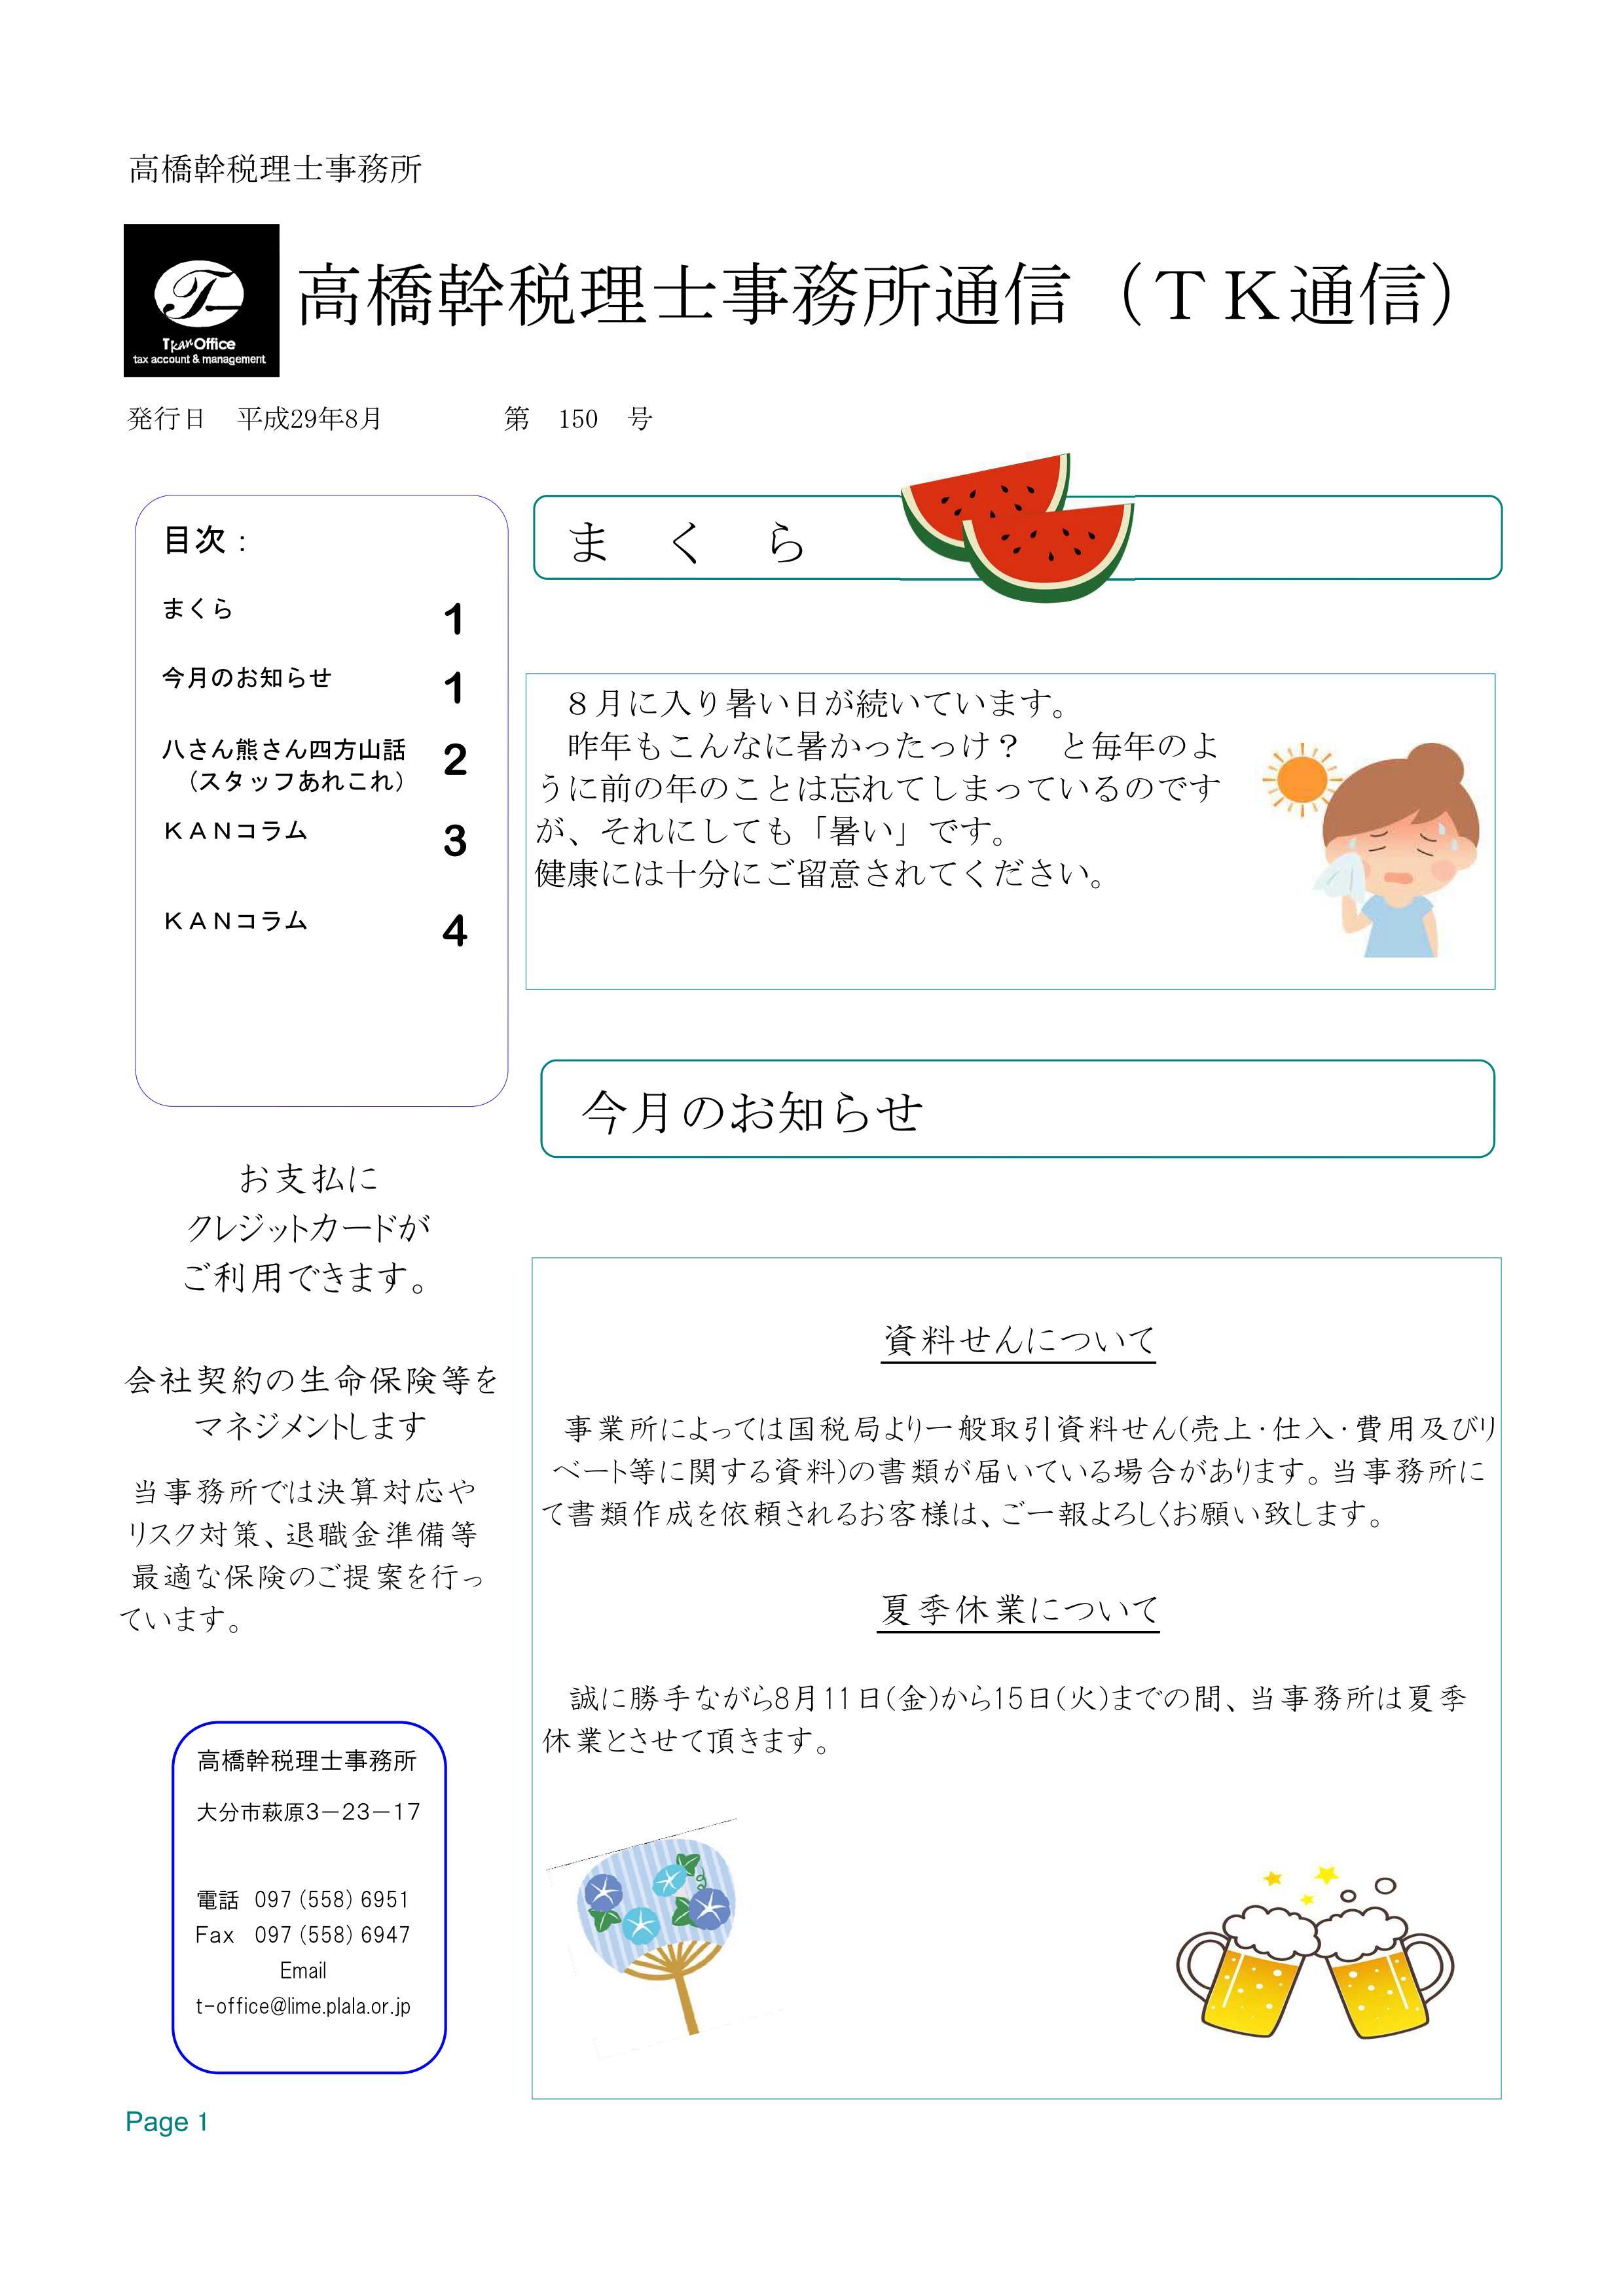 NLH29.08_01.jpg